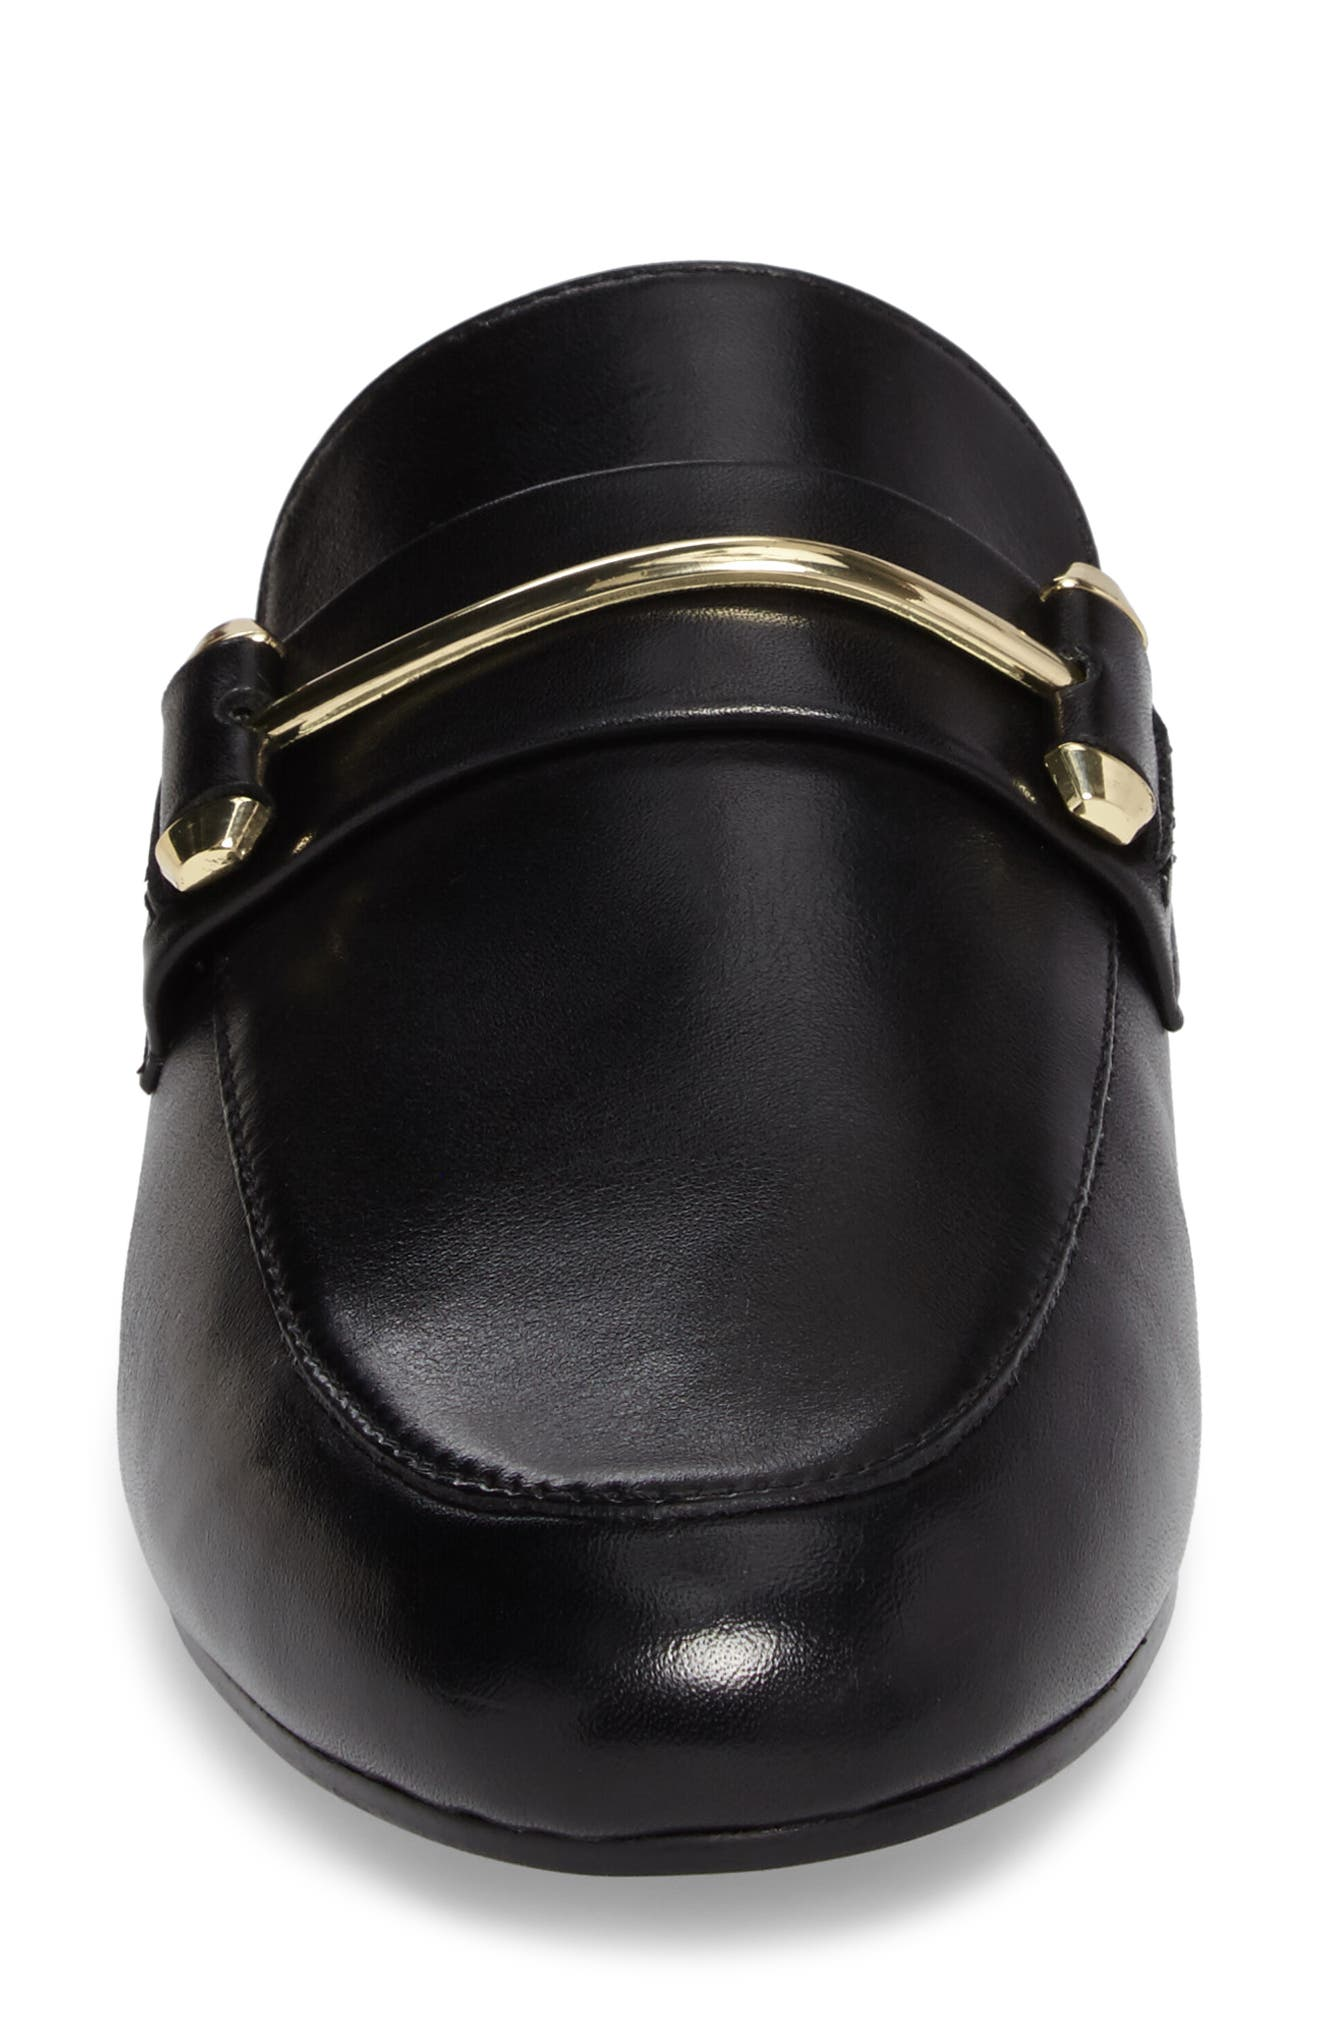 Kera Flat Loafer Mule,                             Alternate thumbnail 4, color,                             Black Leather